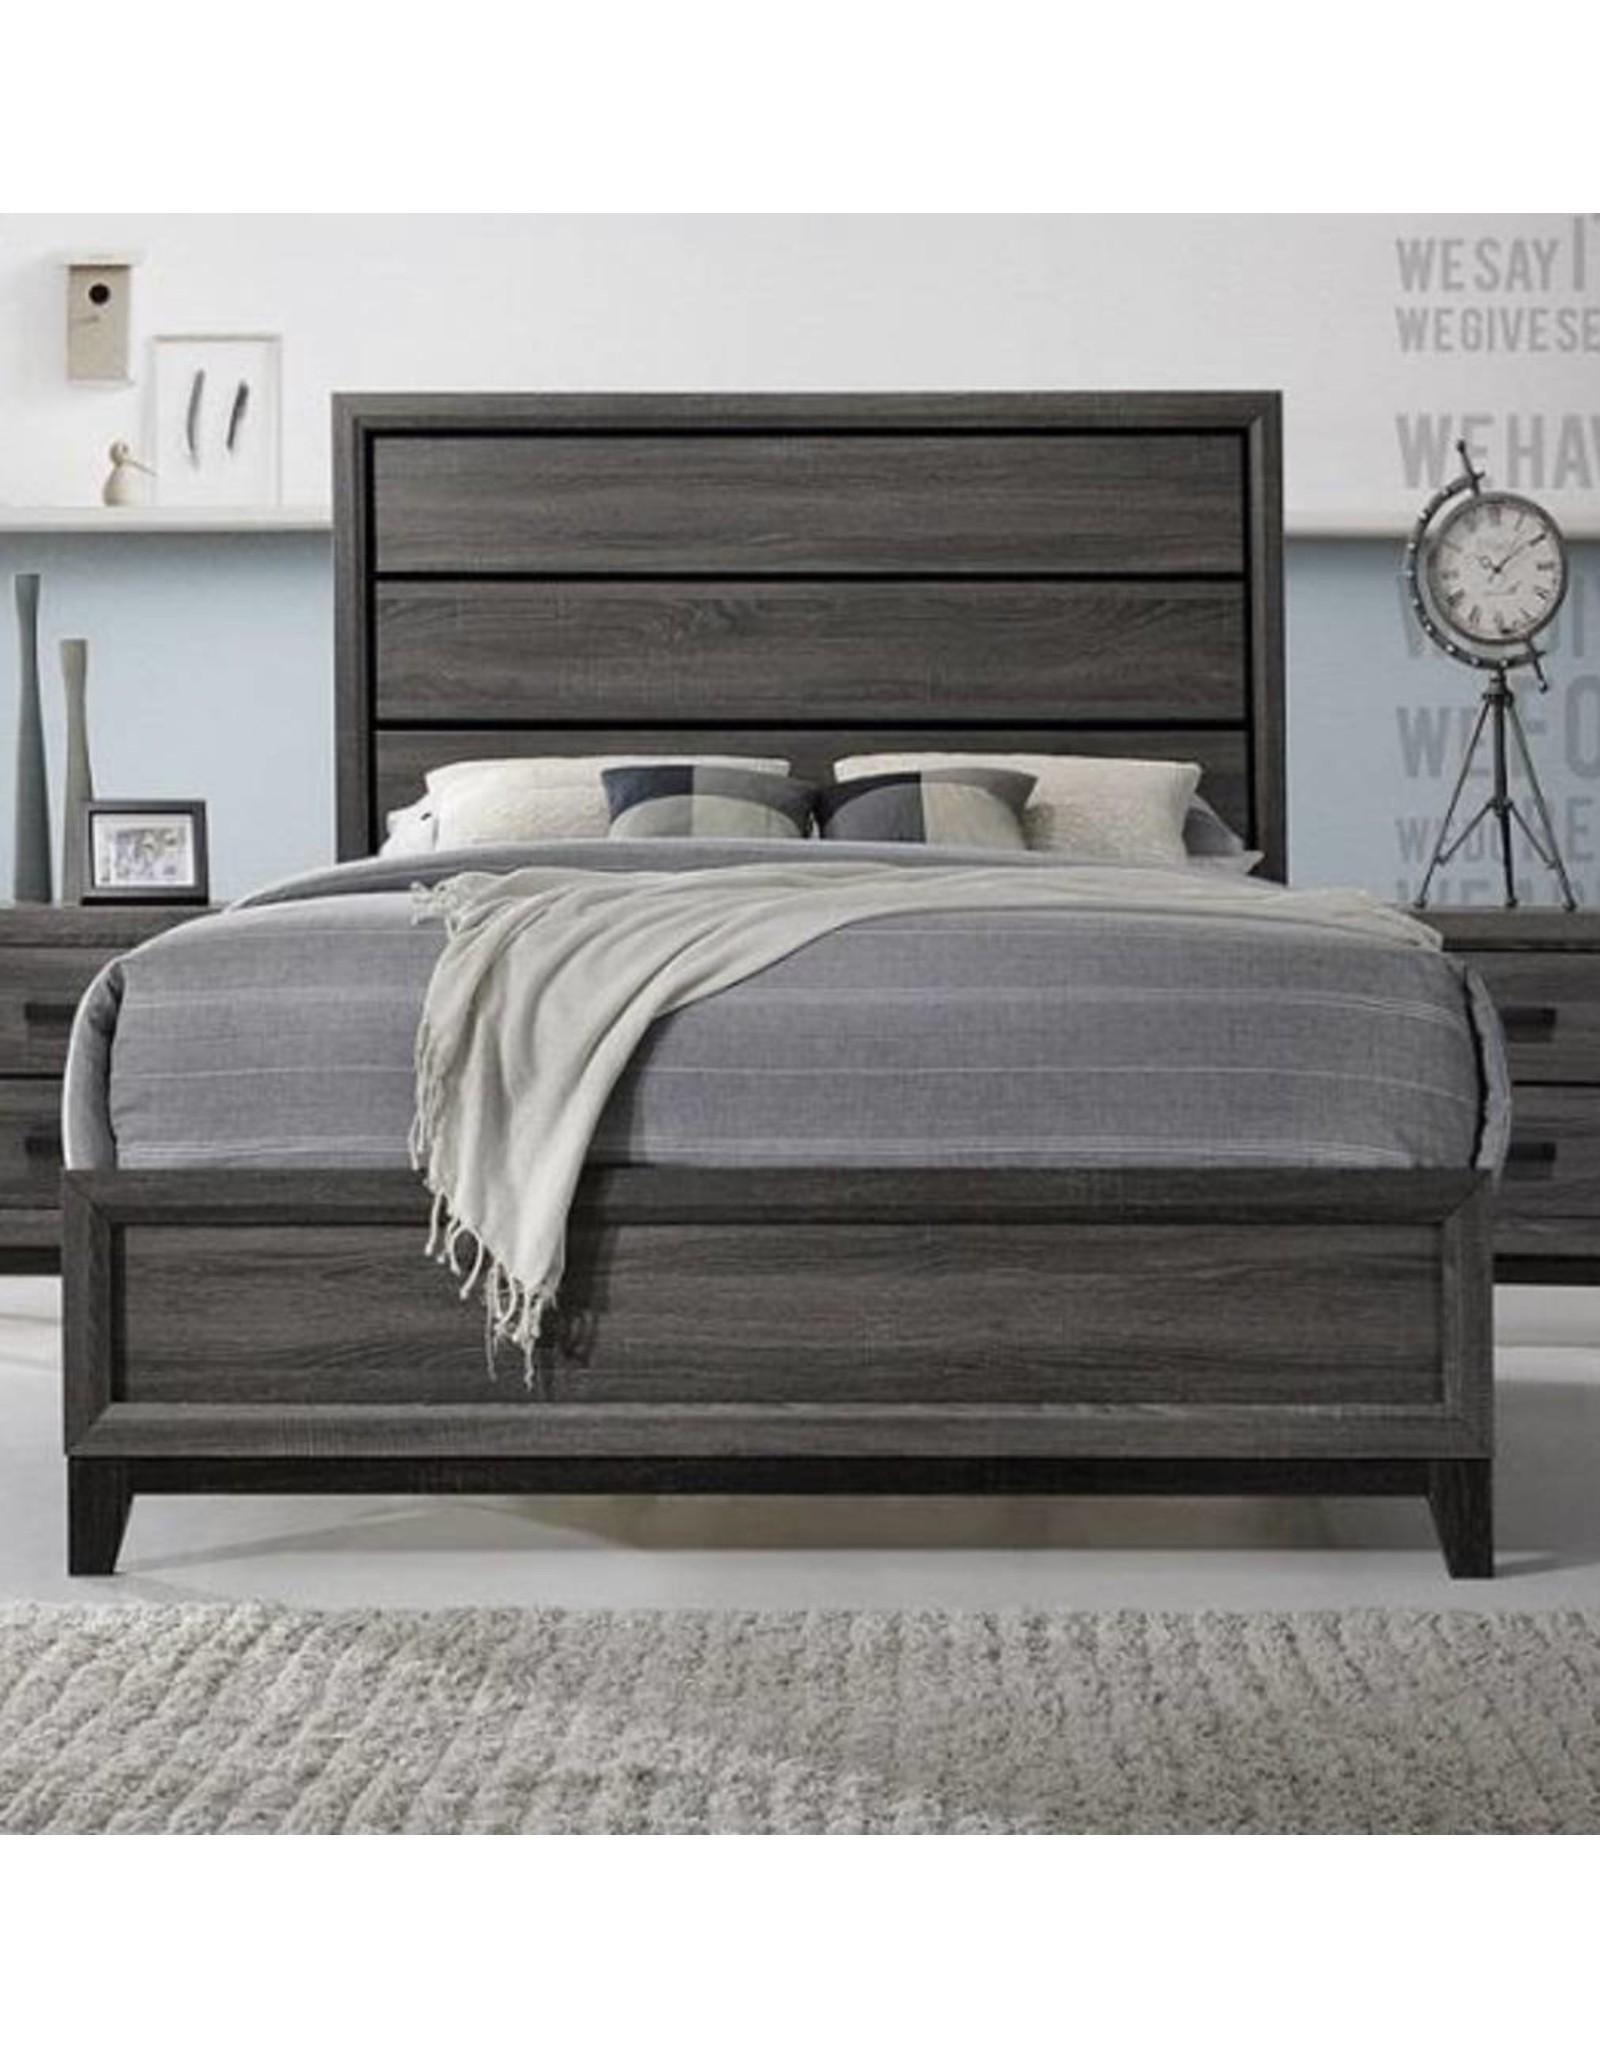 Shiloh SH177 King Bed Gray